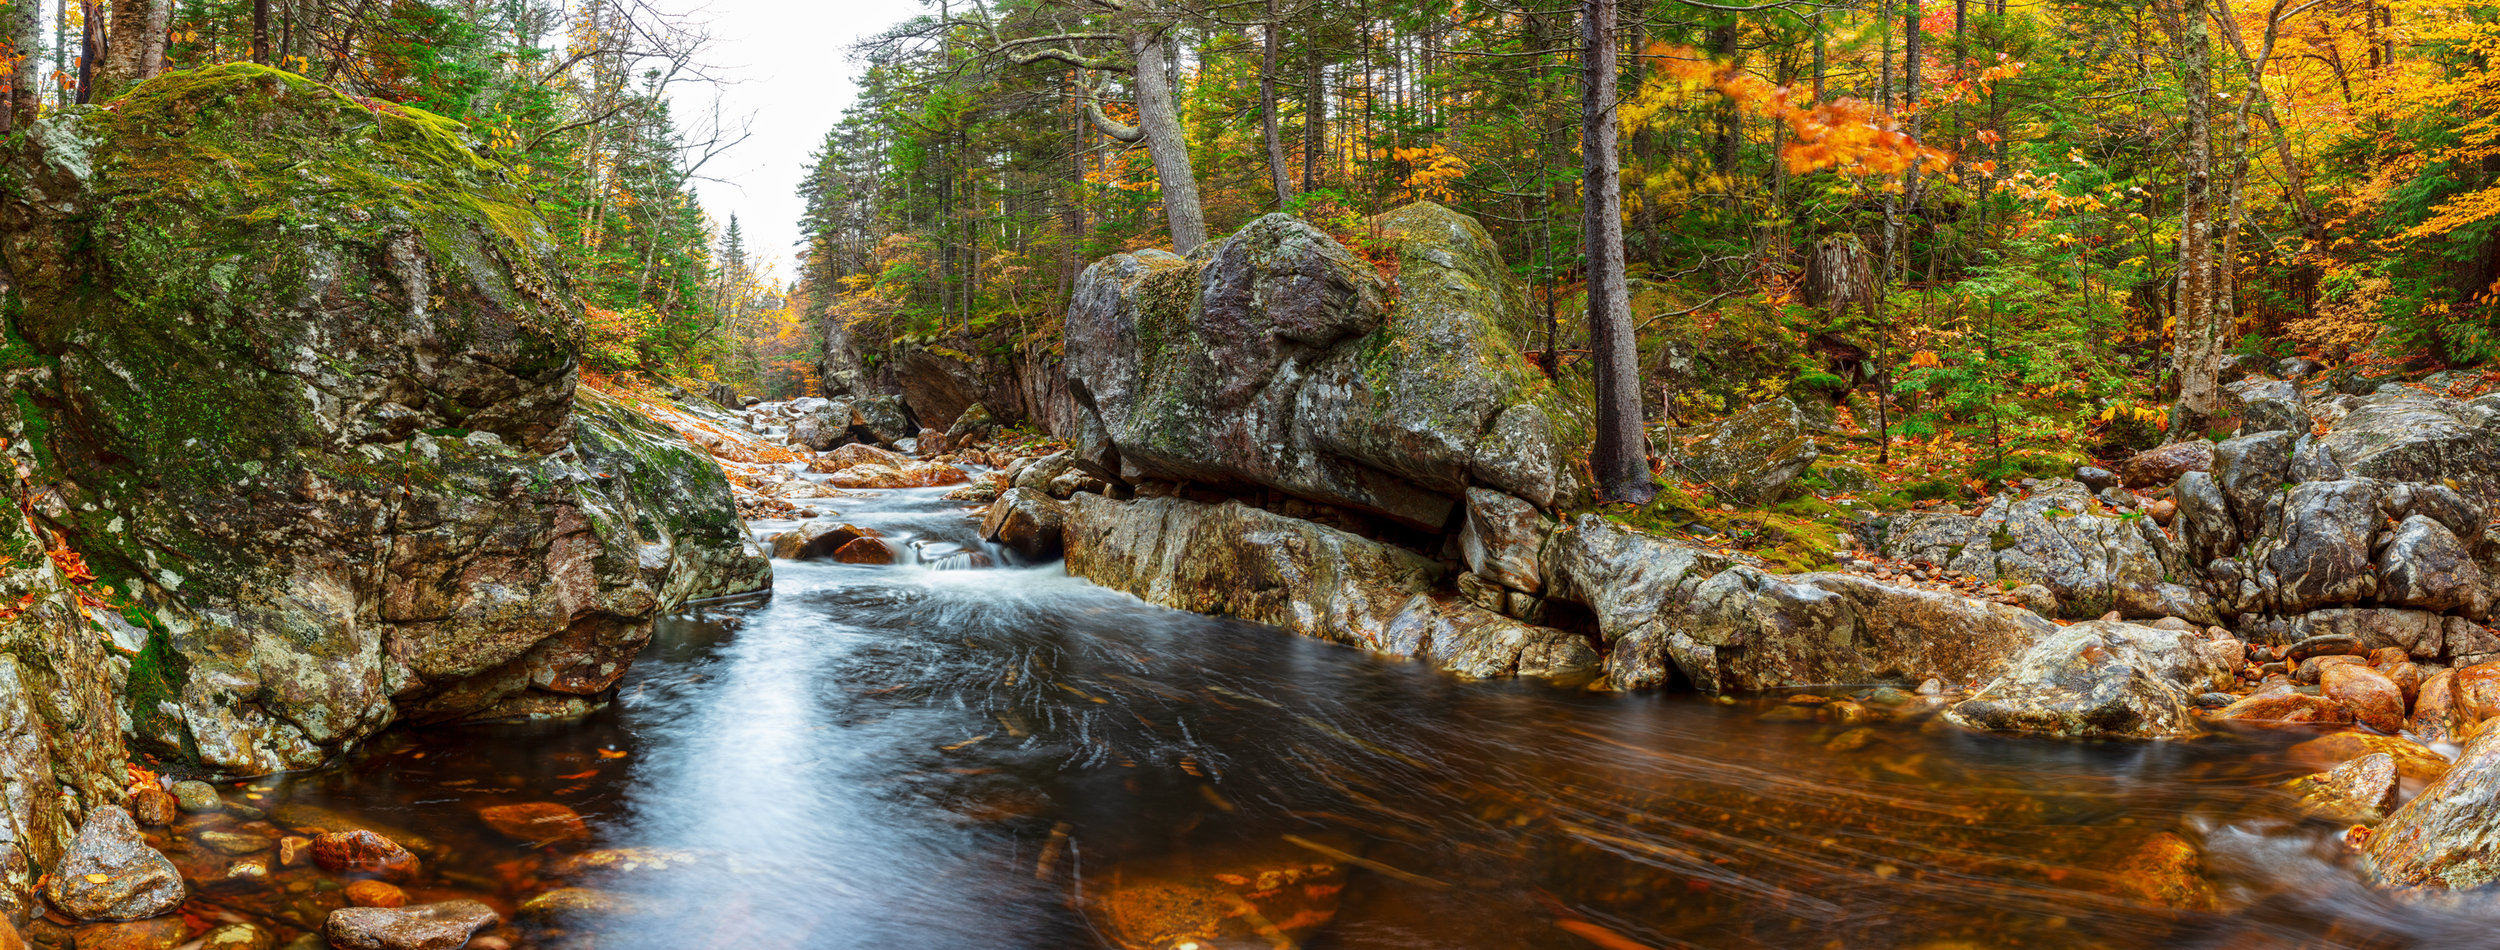 Peabody River, NH